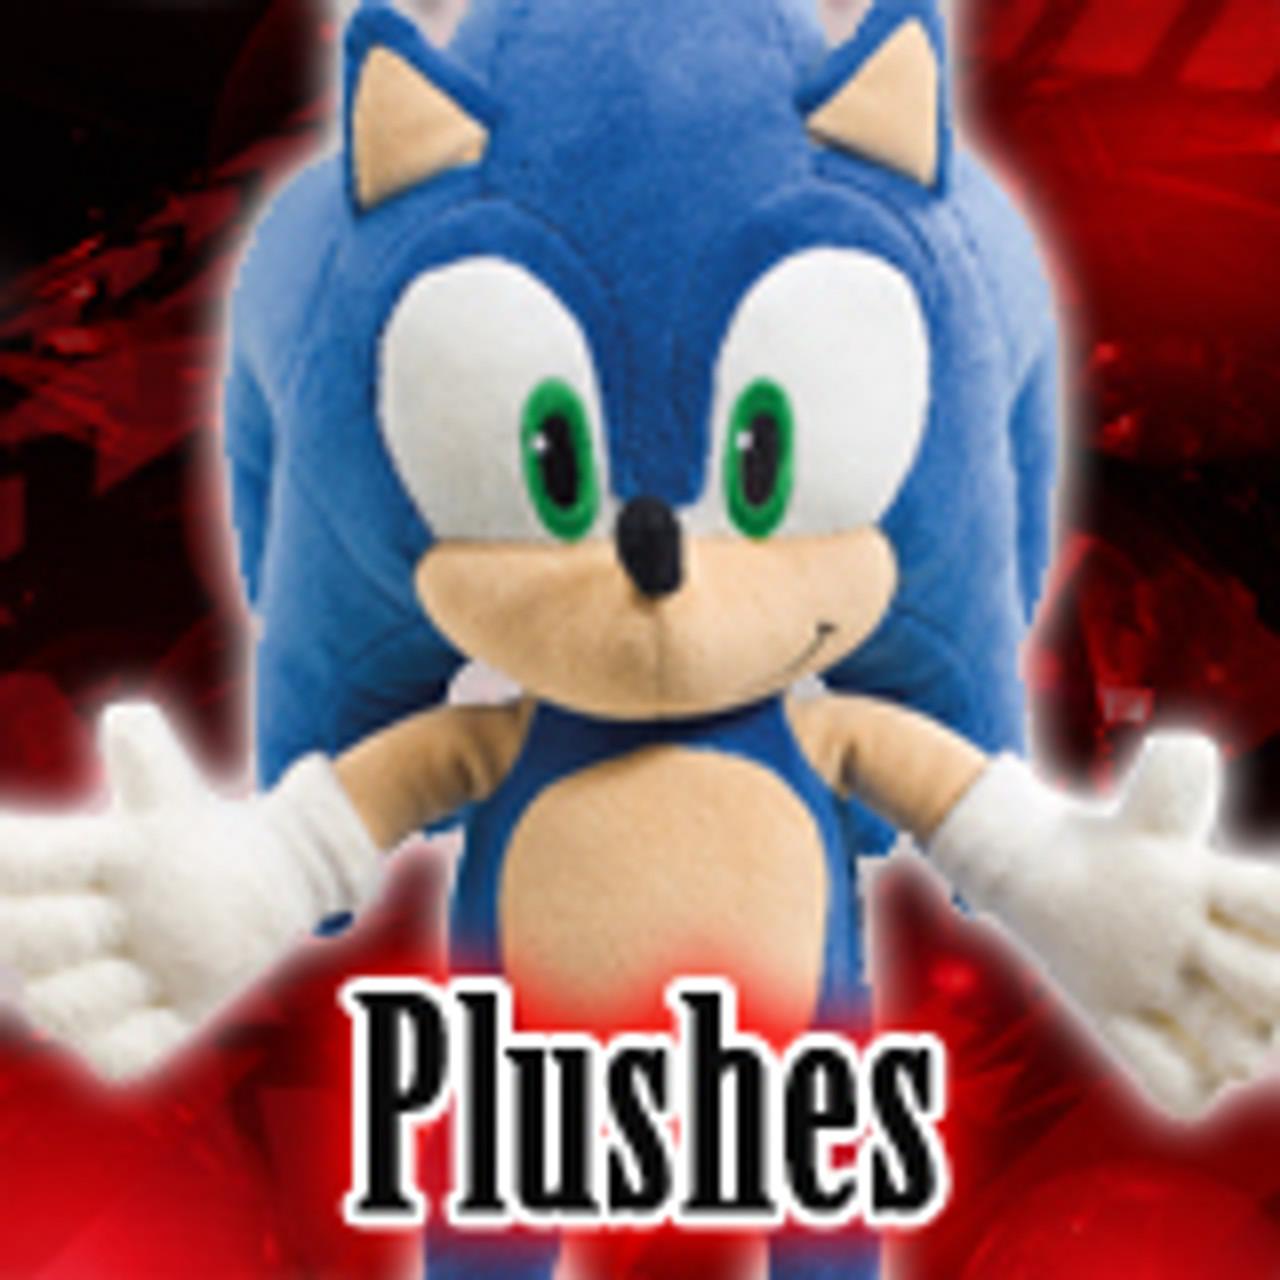 Plushes